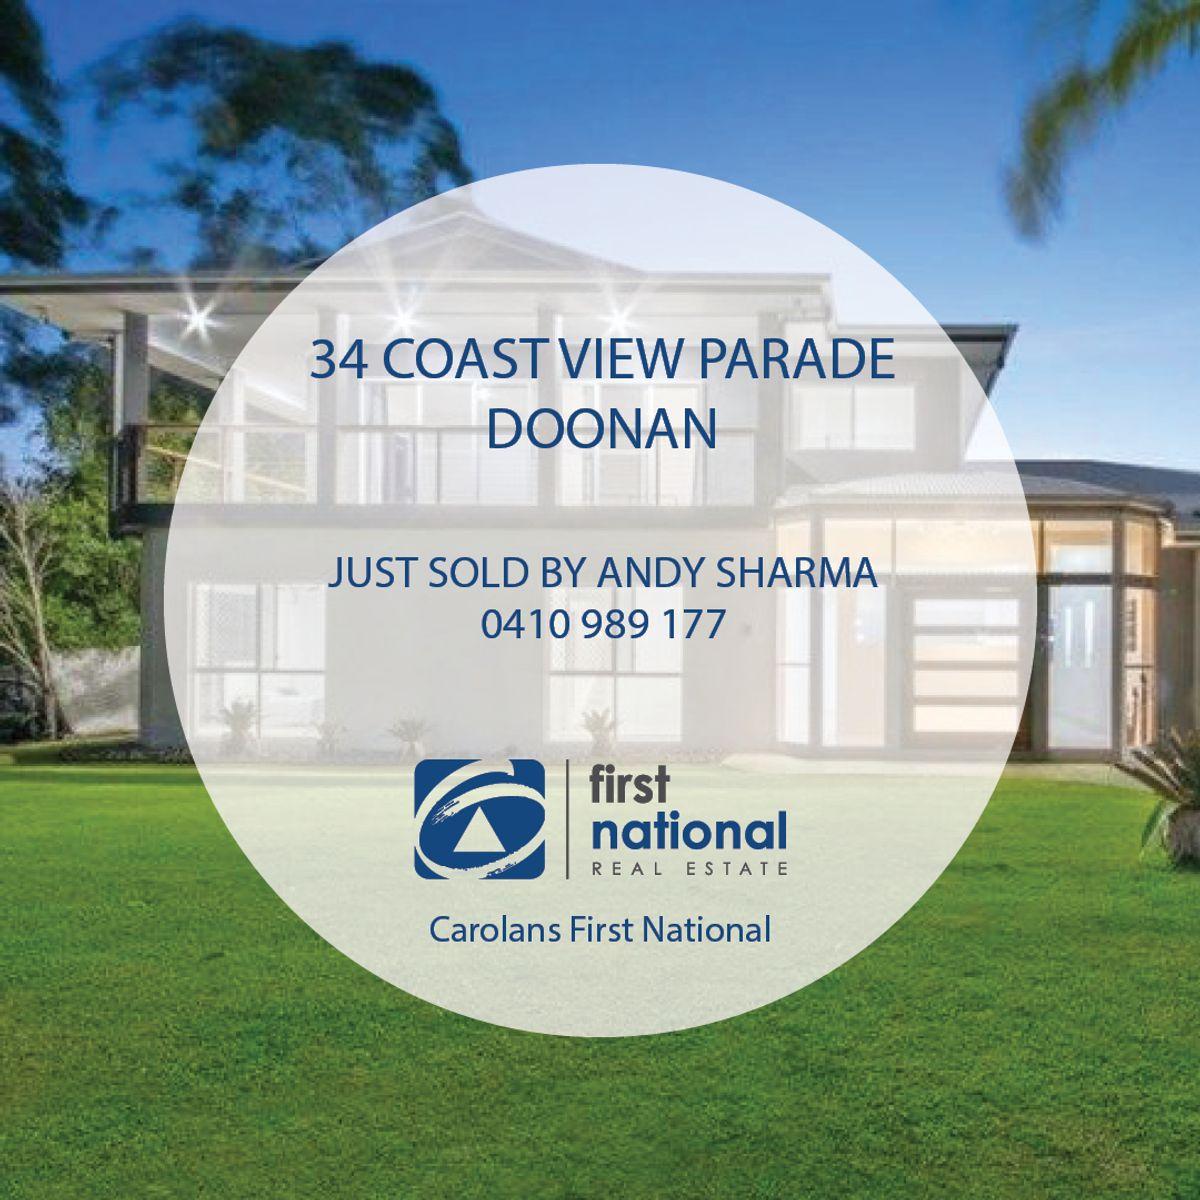 34 Coast View Parade, Doonan, QLD 4562